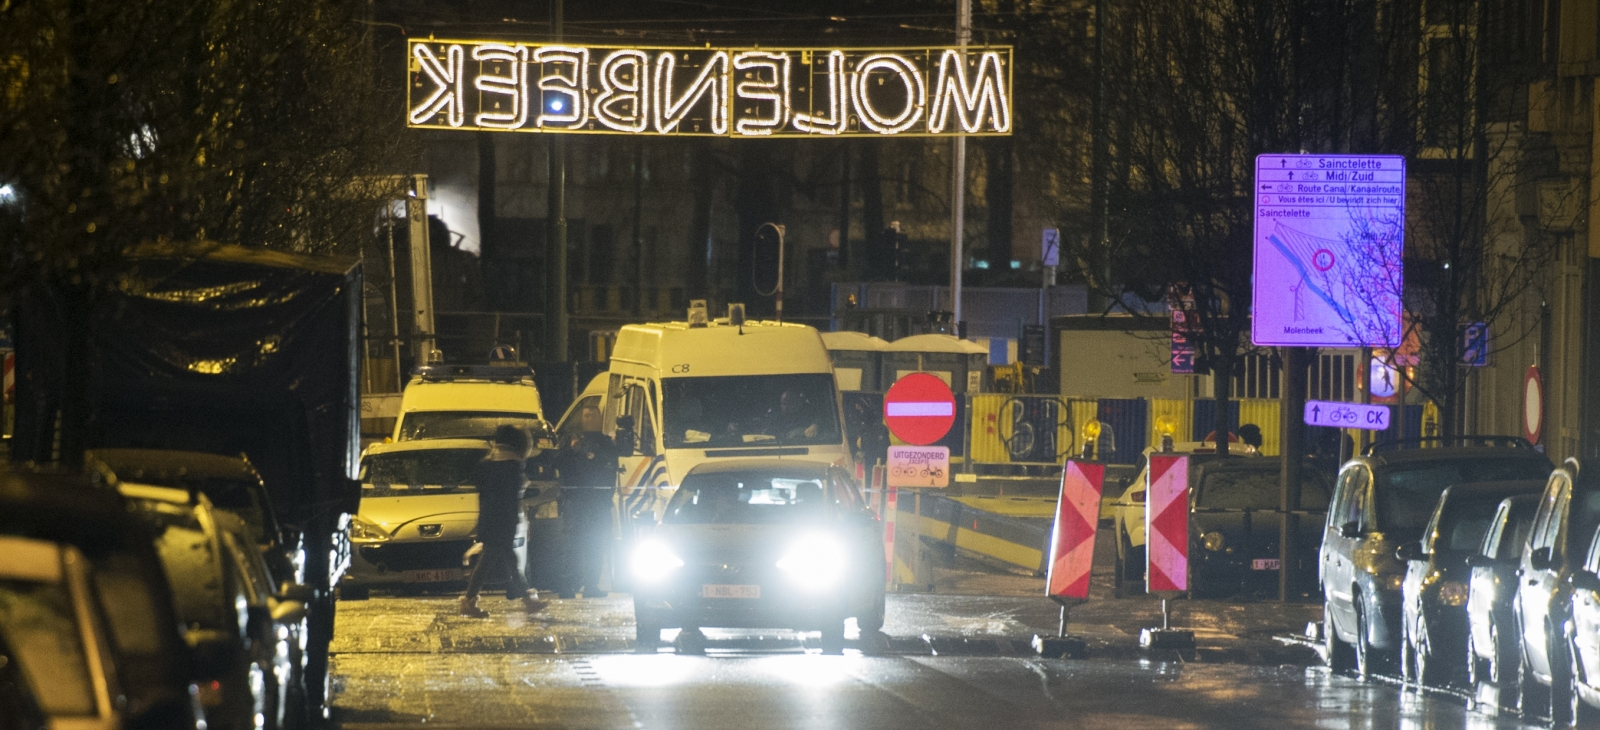 Molenbeek counter-terrorism operation